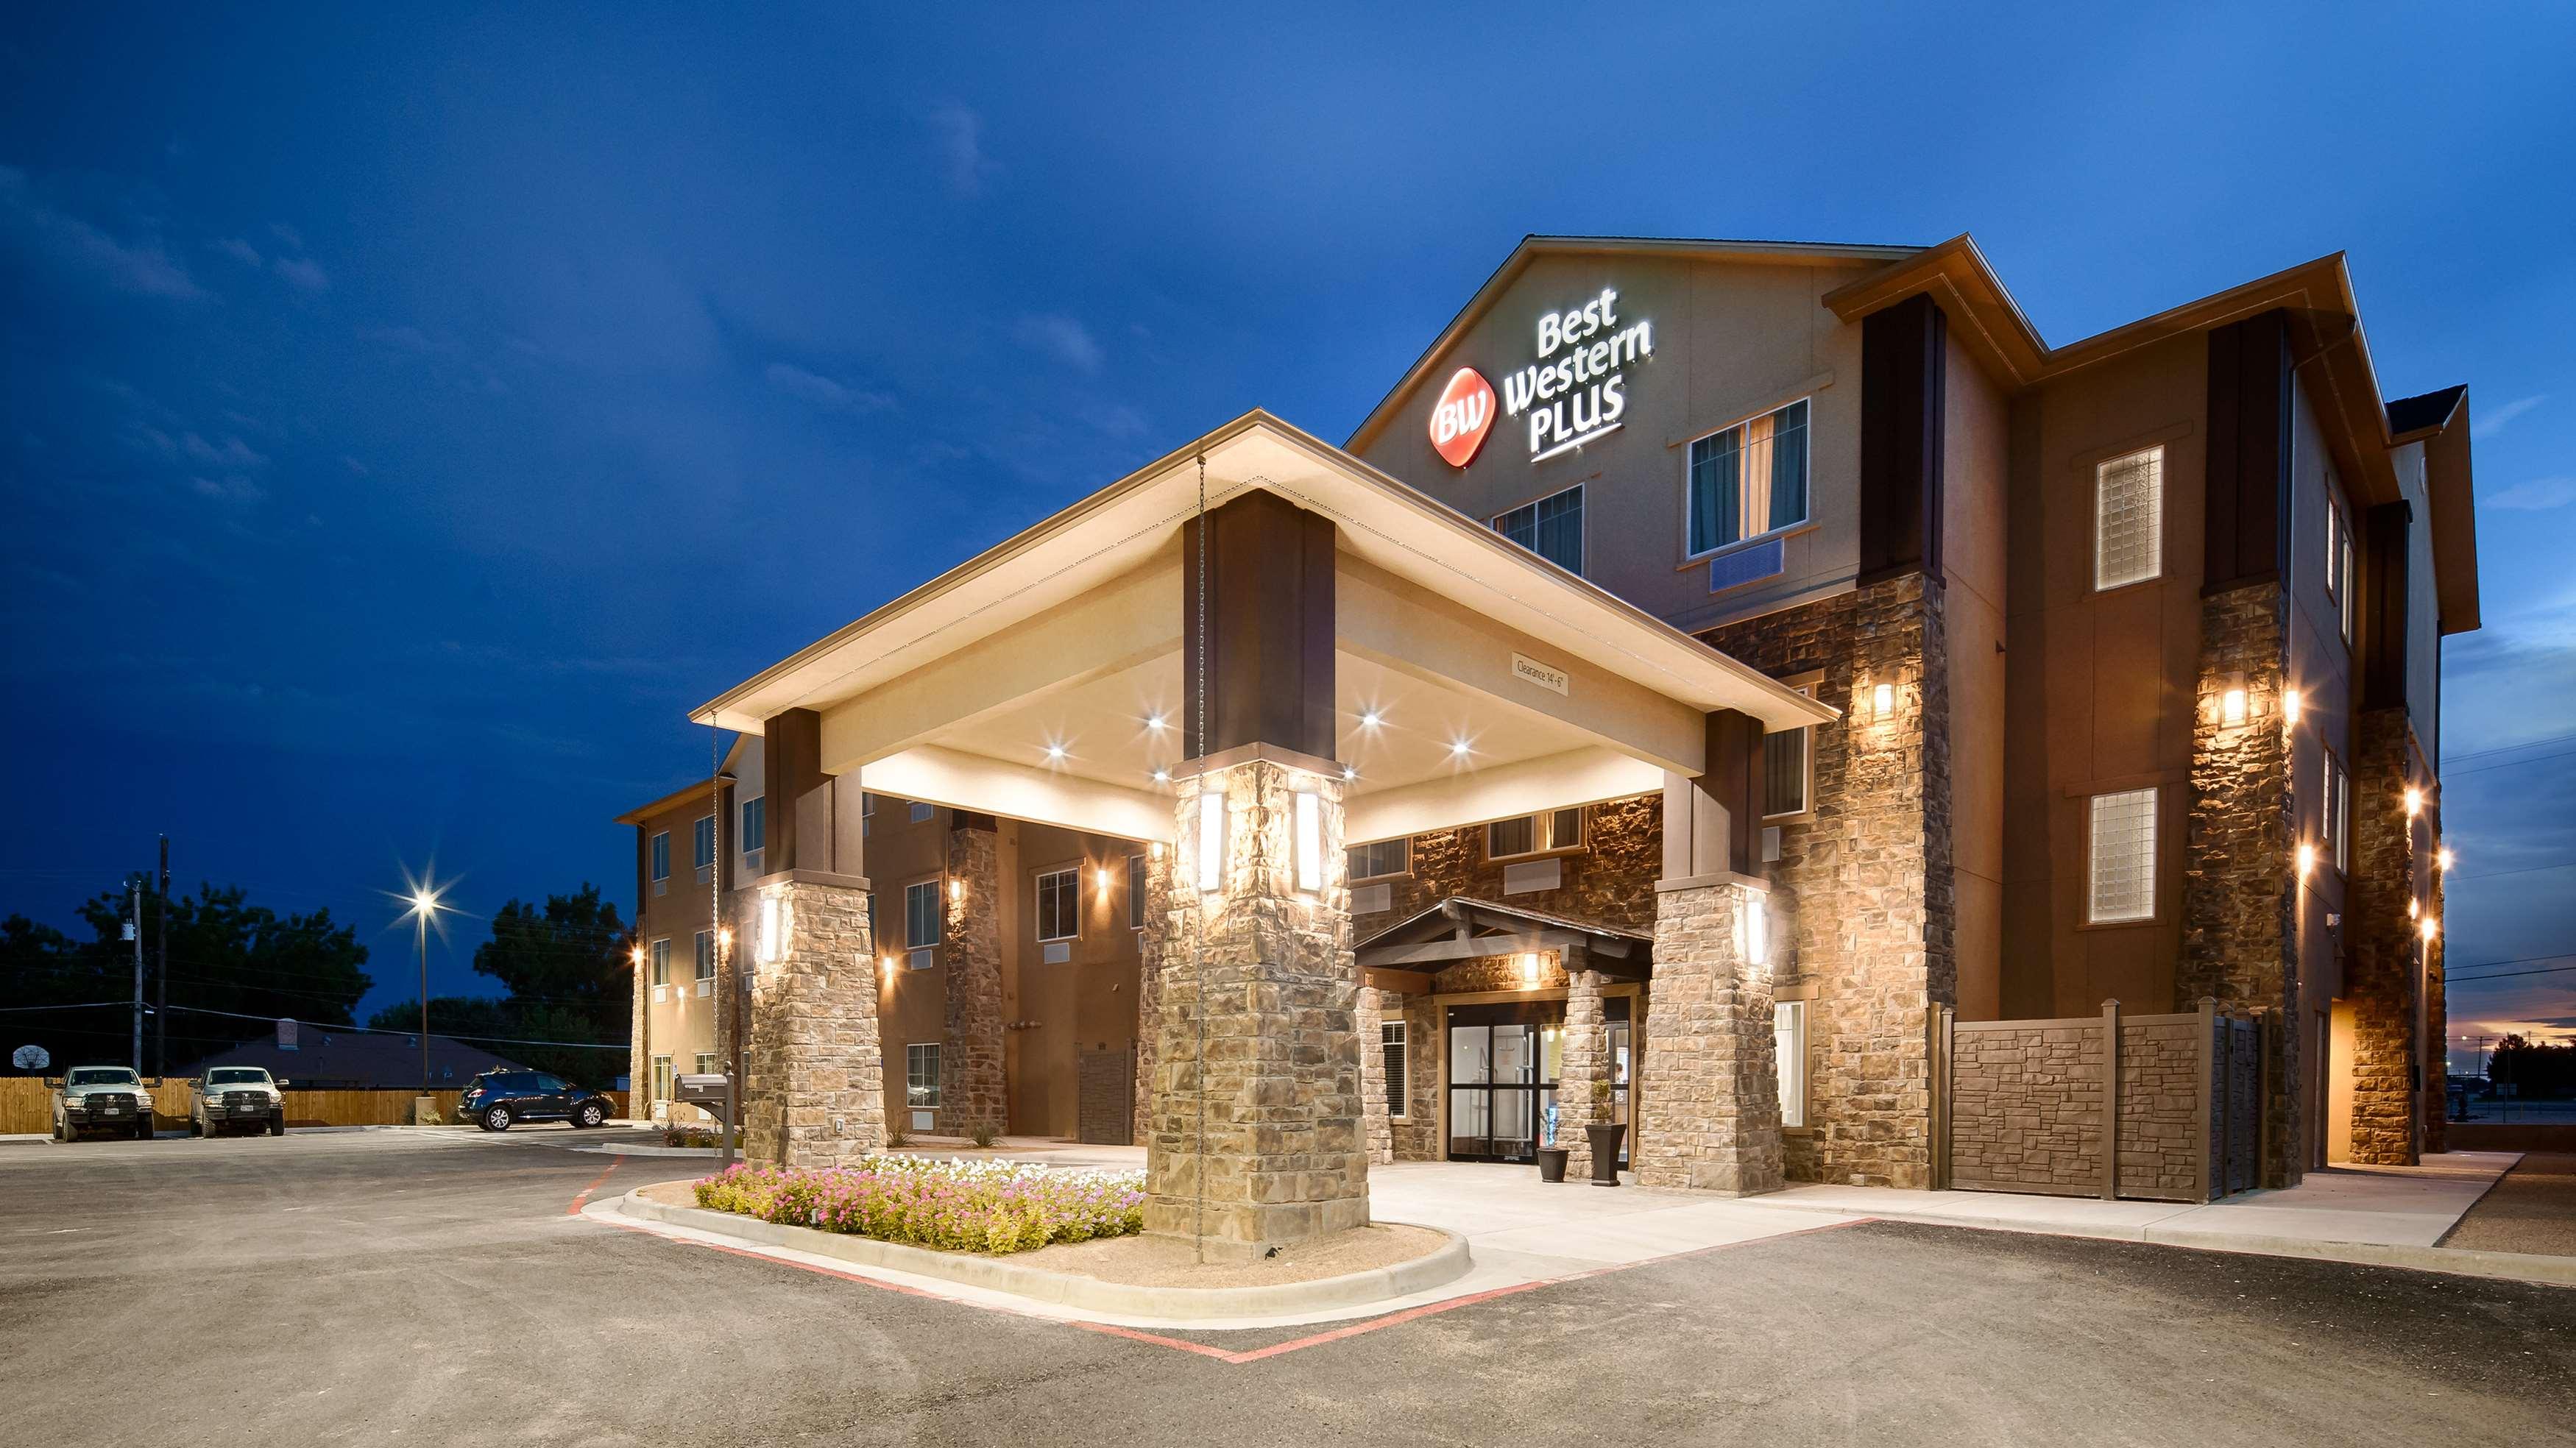 Best Western Plus Denver City Hotel & Suites image 1